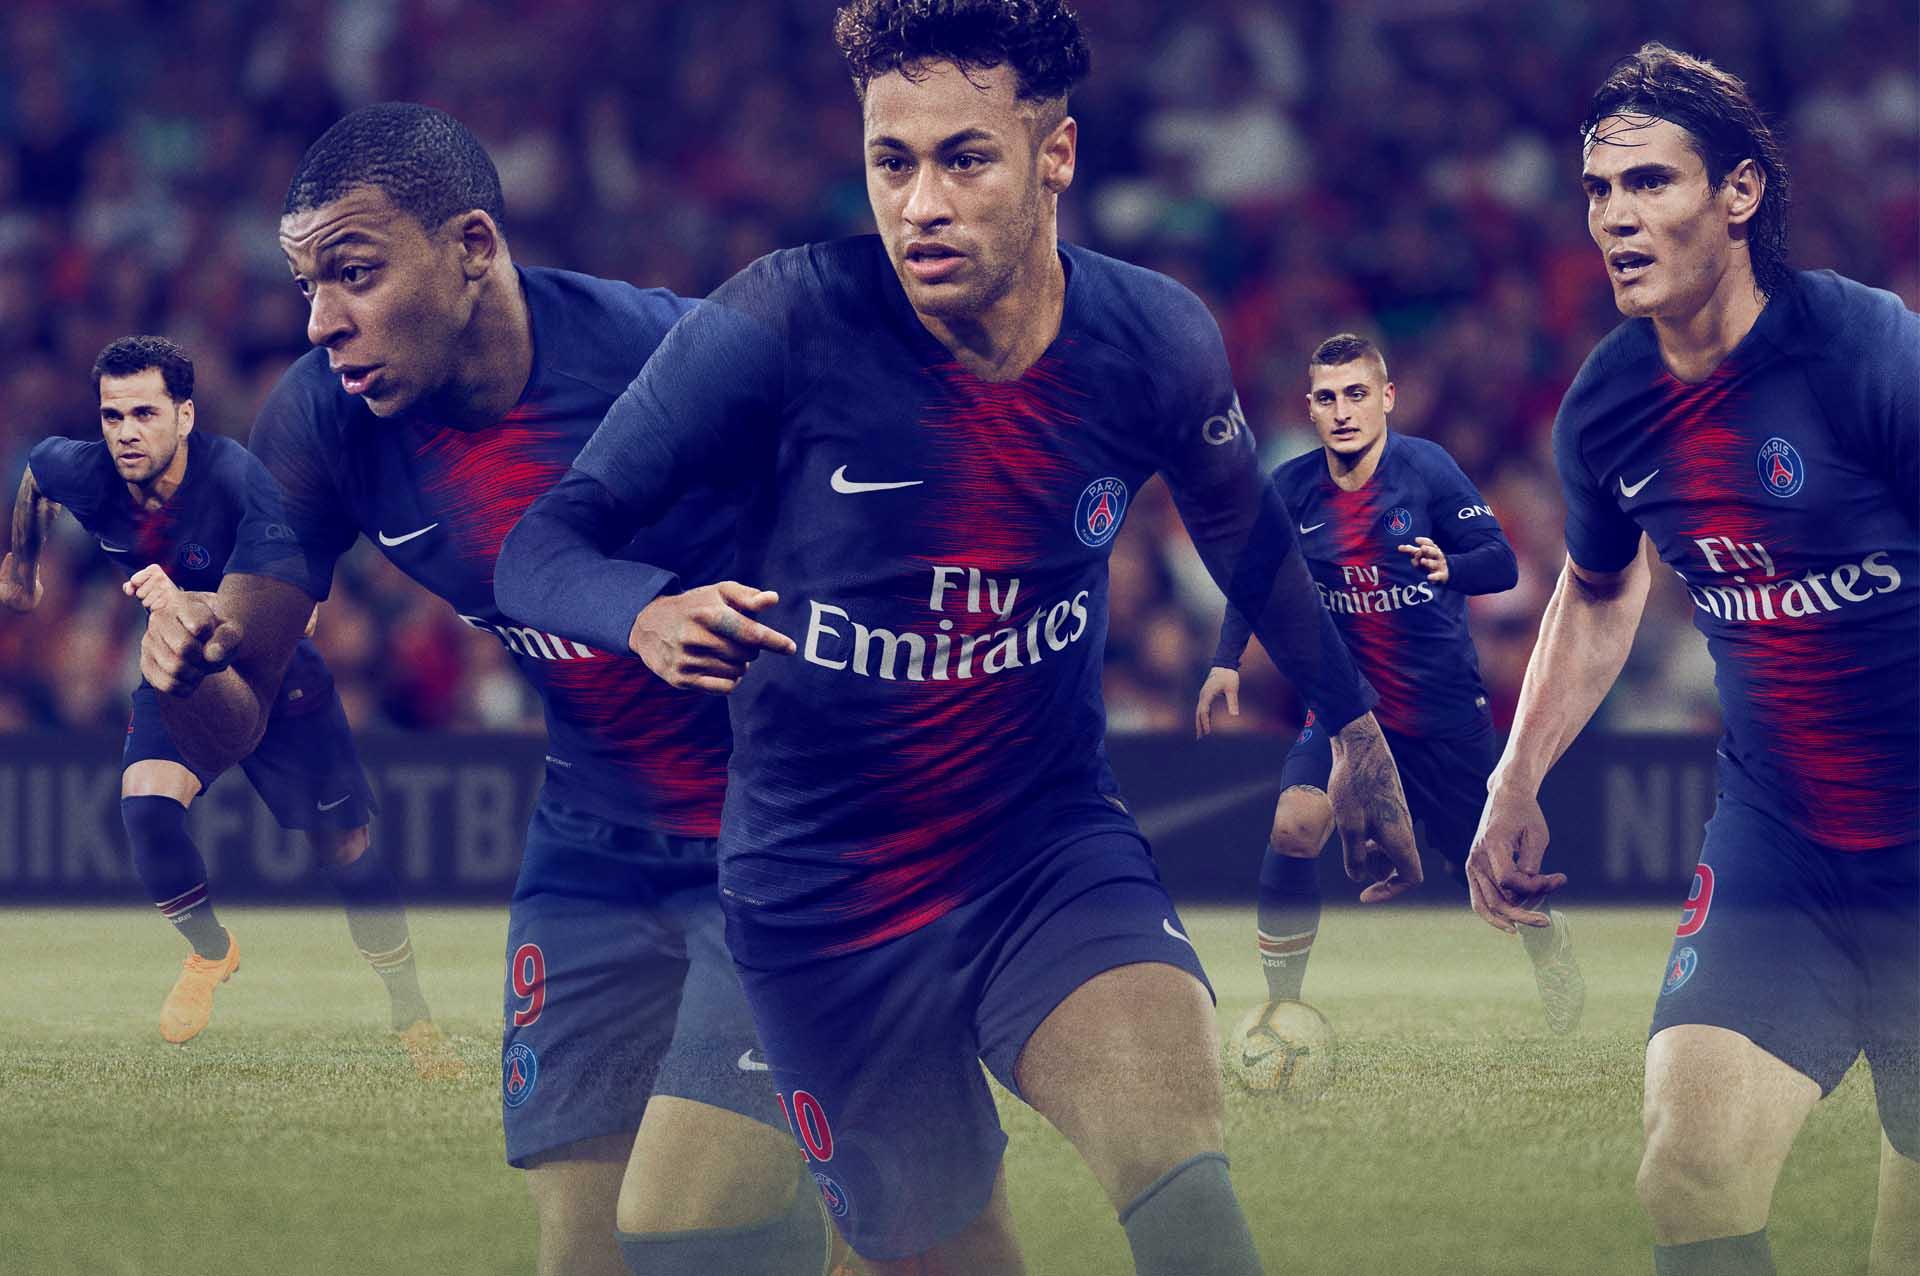 Nike Football unveils 201819 PSG home kit 1920x1276